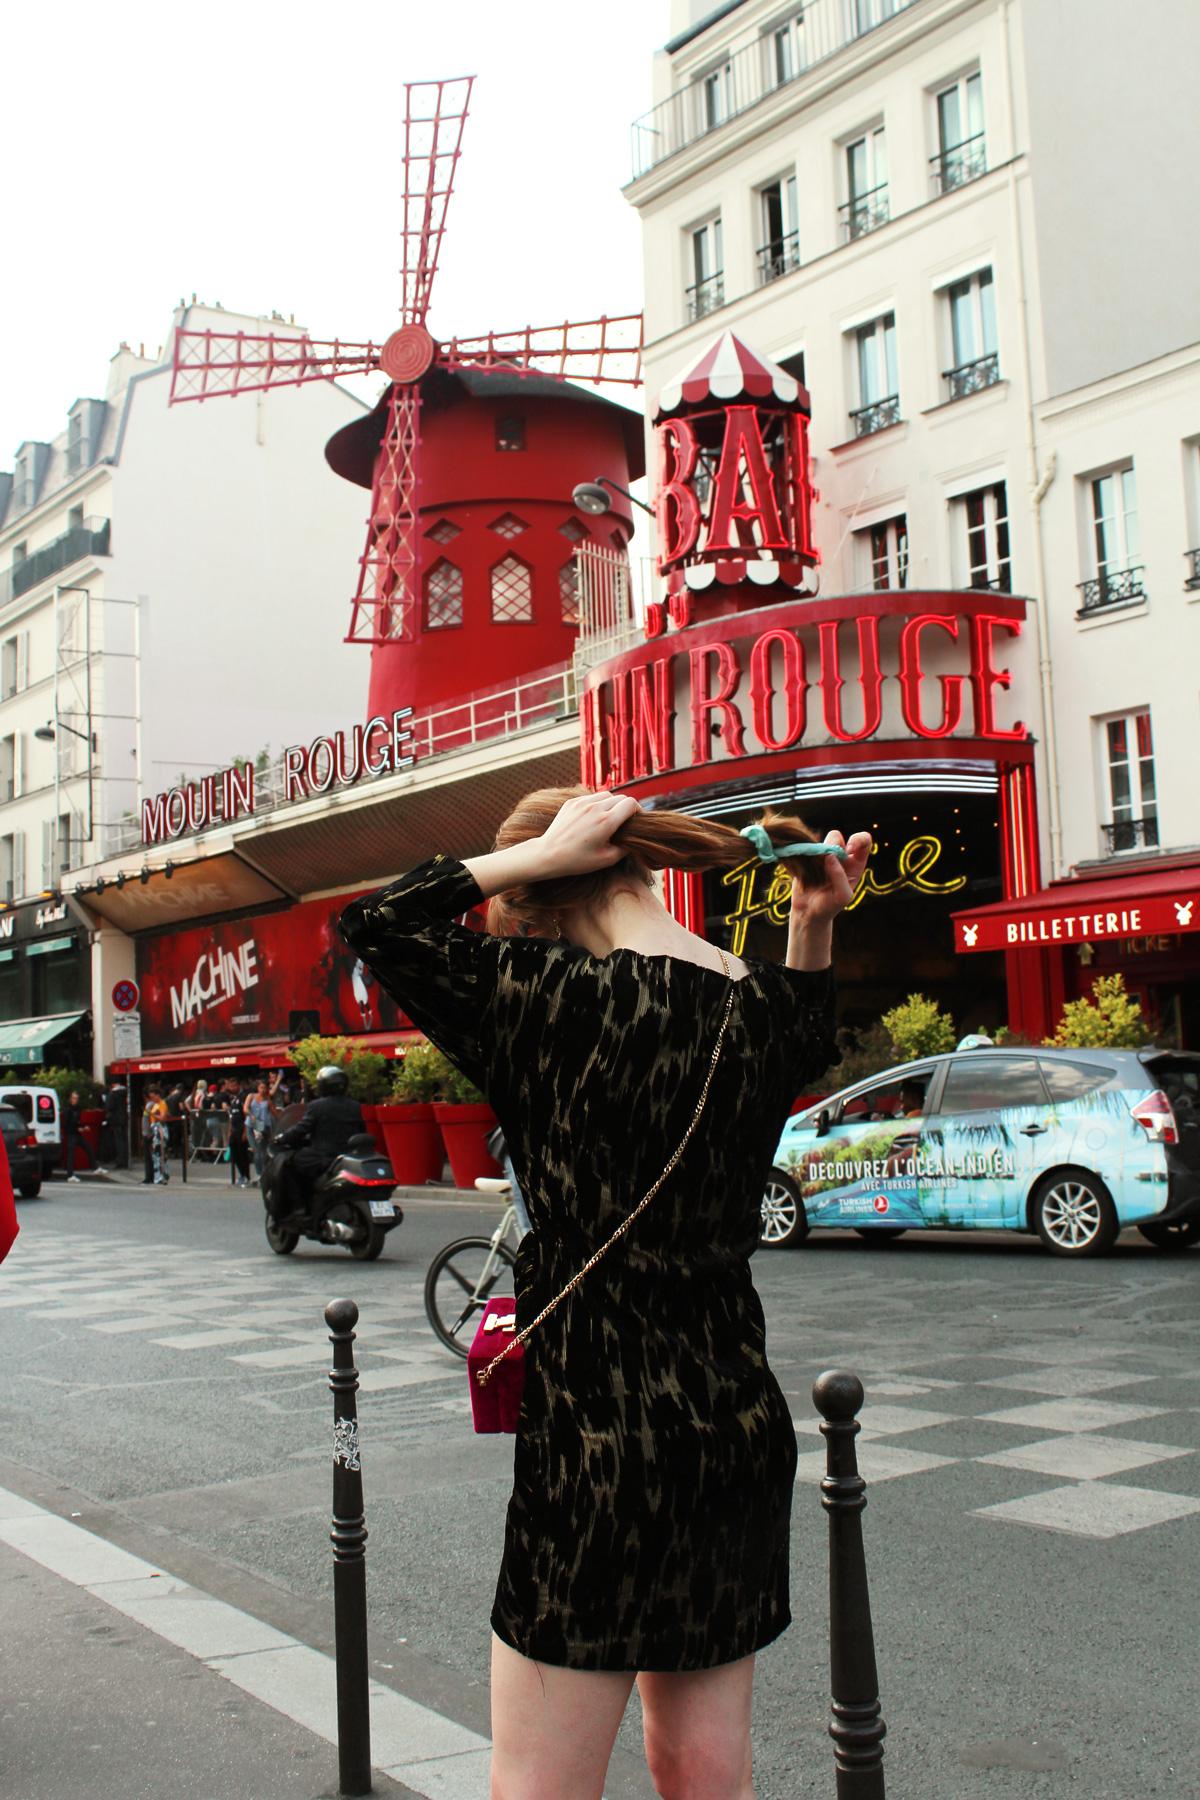 Qué ver en París: Moulin Rouge-martinalubian.com